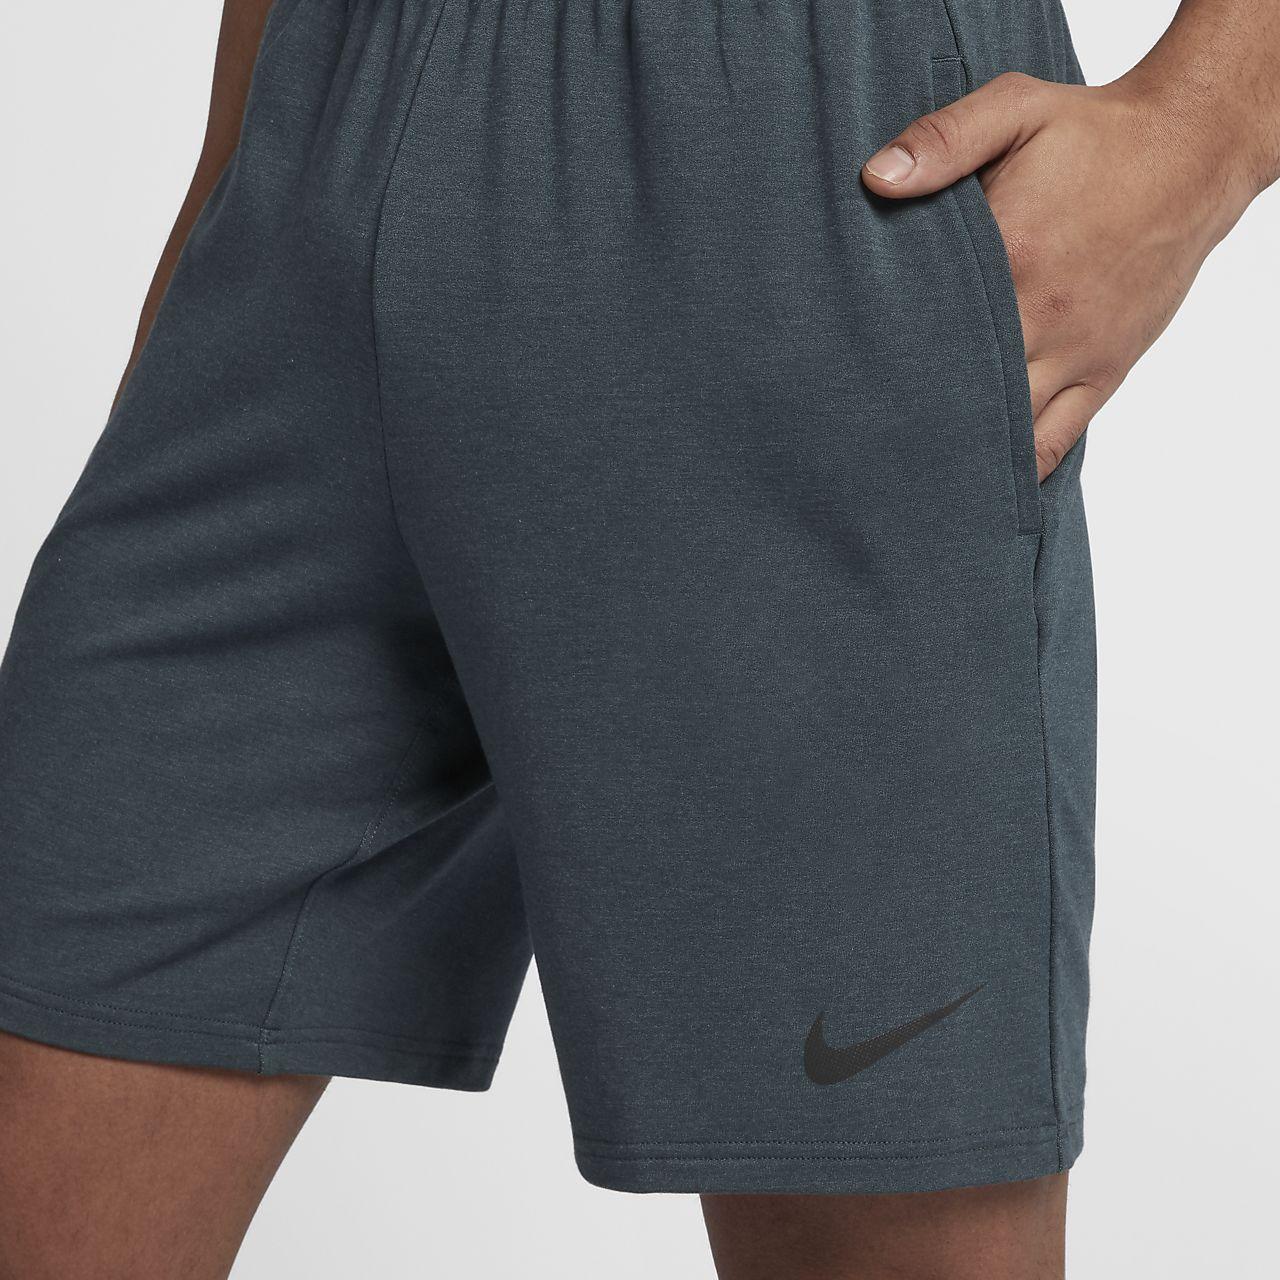 20 cm) Nike Dri-FIT Herren-Trainingsshorts (ca. 20 cm)